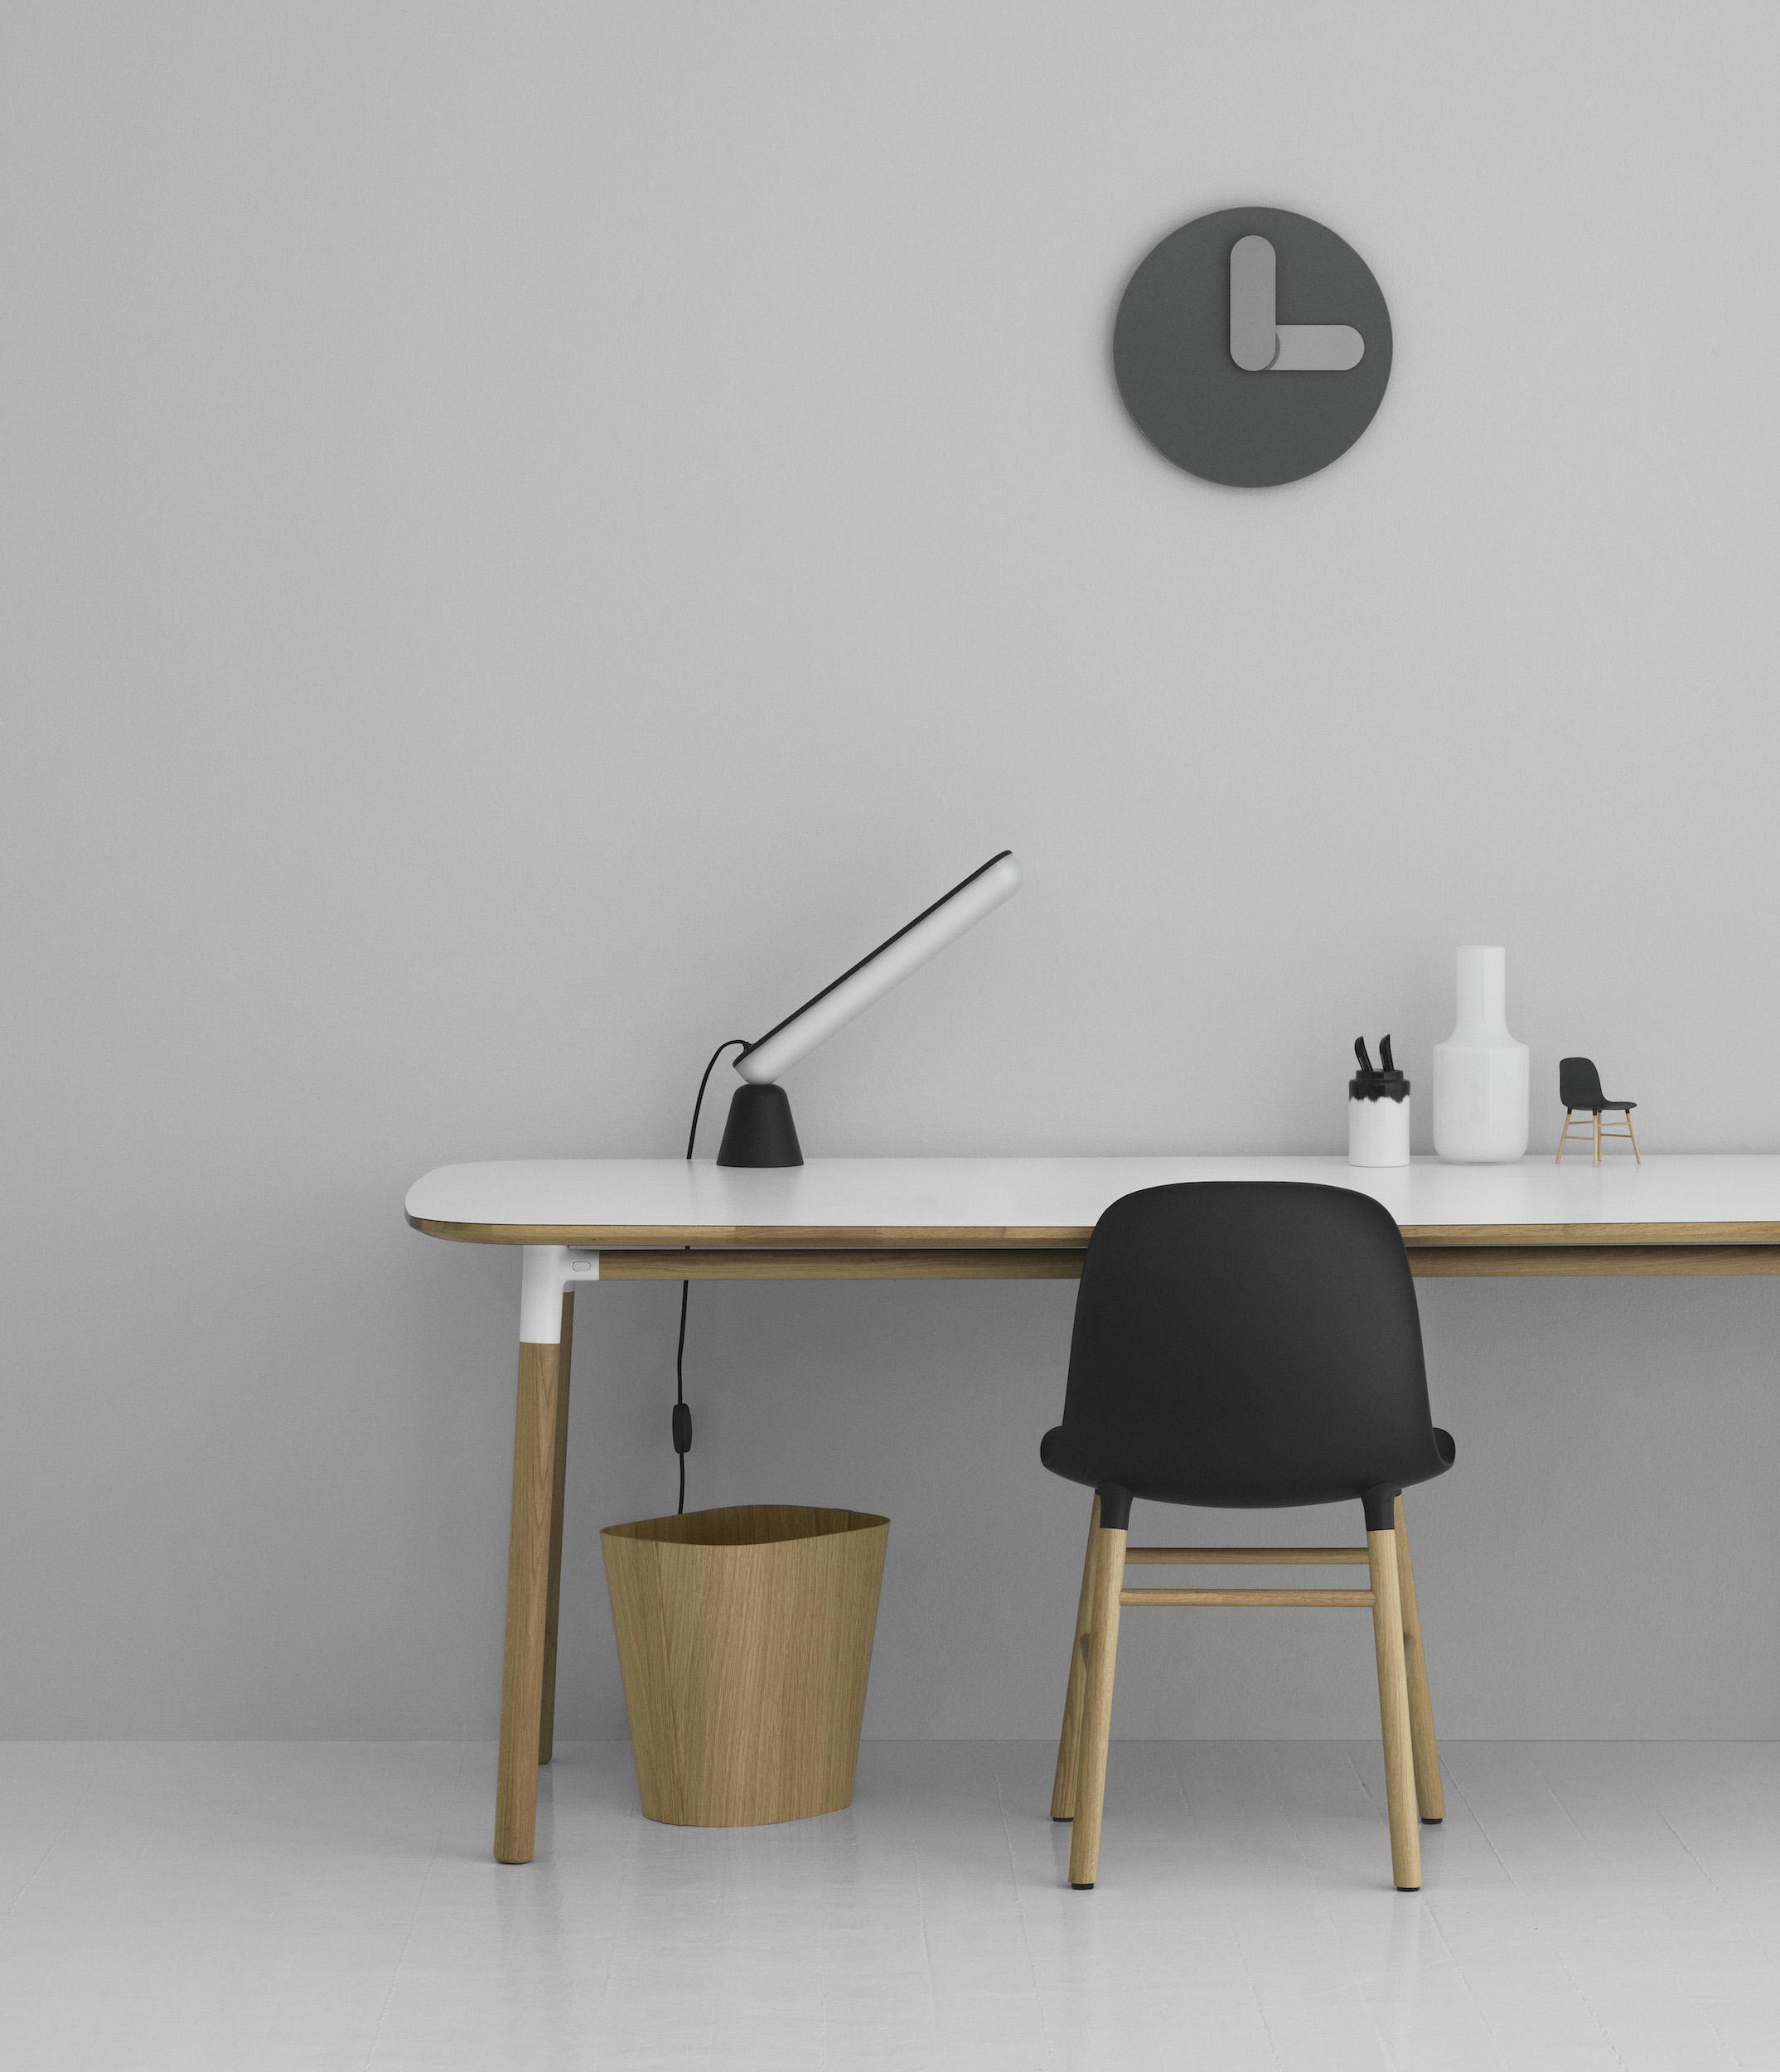 Acrobat table lamp normann copenhagen httpsscandinavia designwaps1520waindexpserviceprrendererlangenfilterlistq1194211943pn1ps100layoutlayout6 geotapseo Choice Image